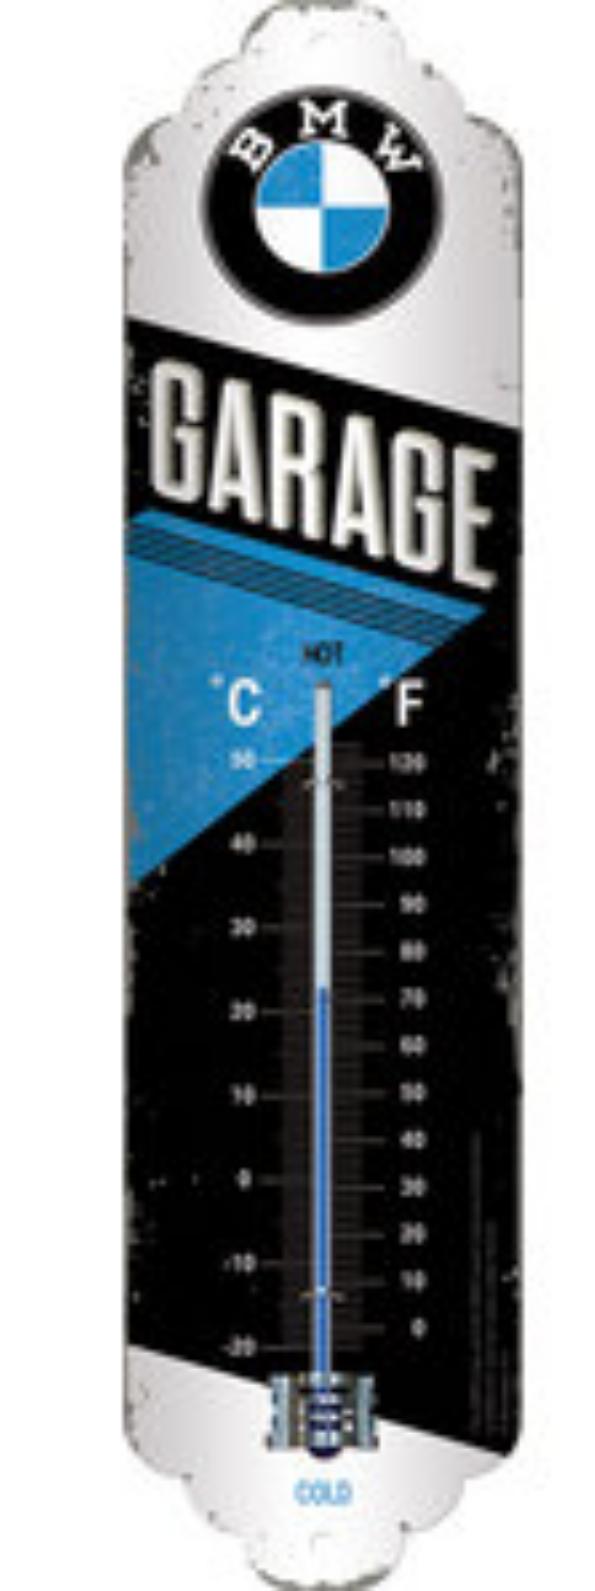 Thermomètre BMW garage